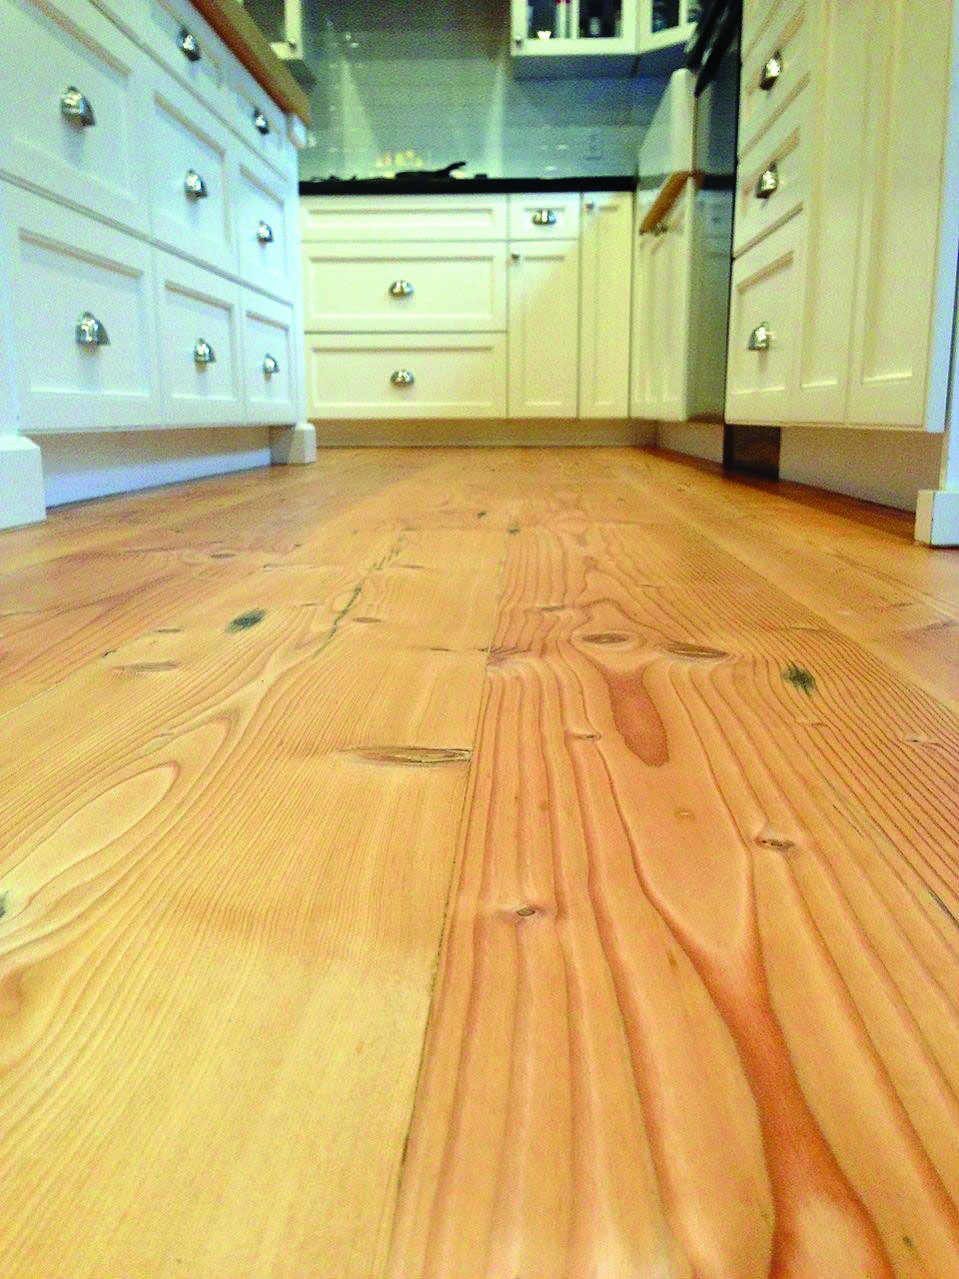 New Hardwood Floor Refinishing Cost Calculator Only In Shopyhomes Com Refinishing Hardwood Floors Flooring Hardwood Floors